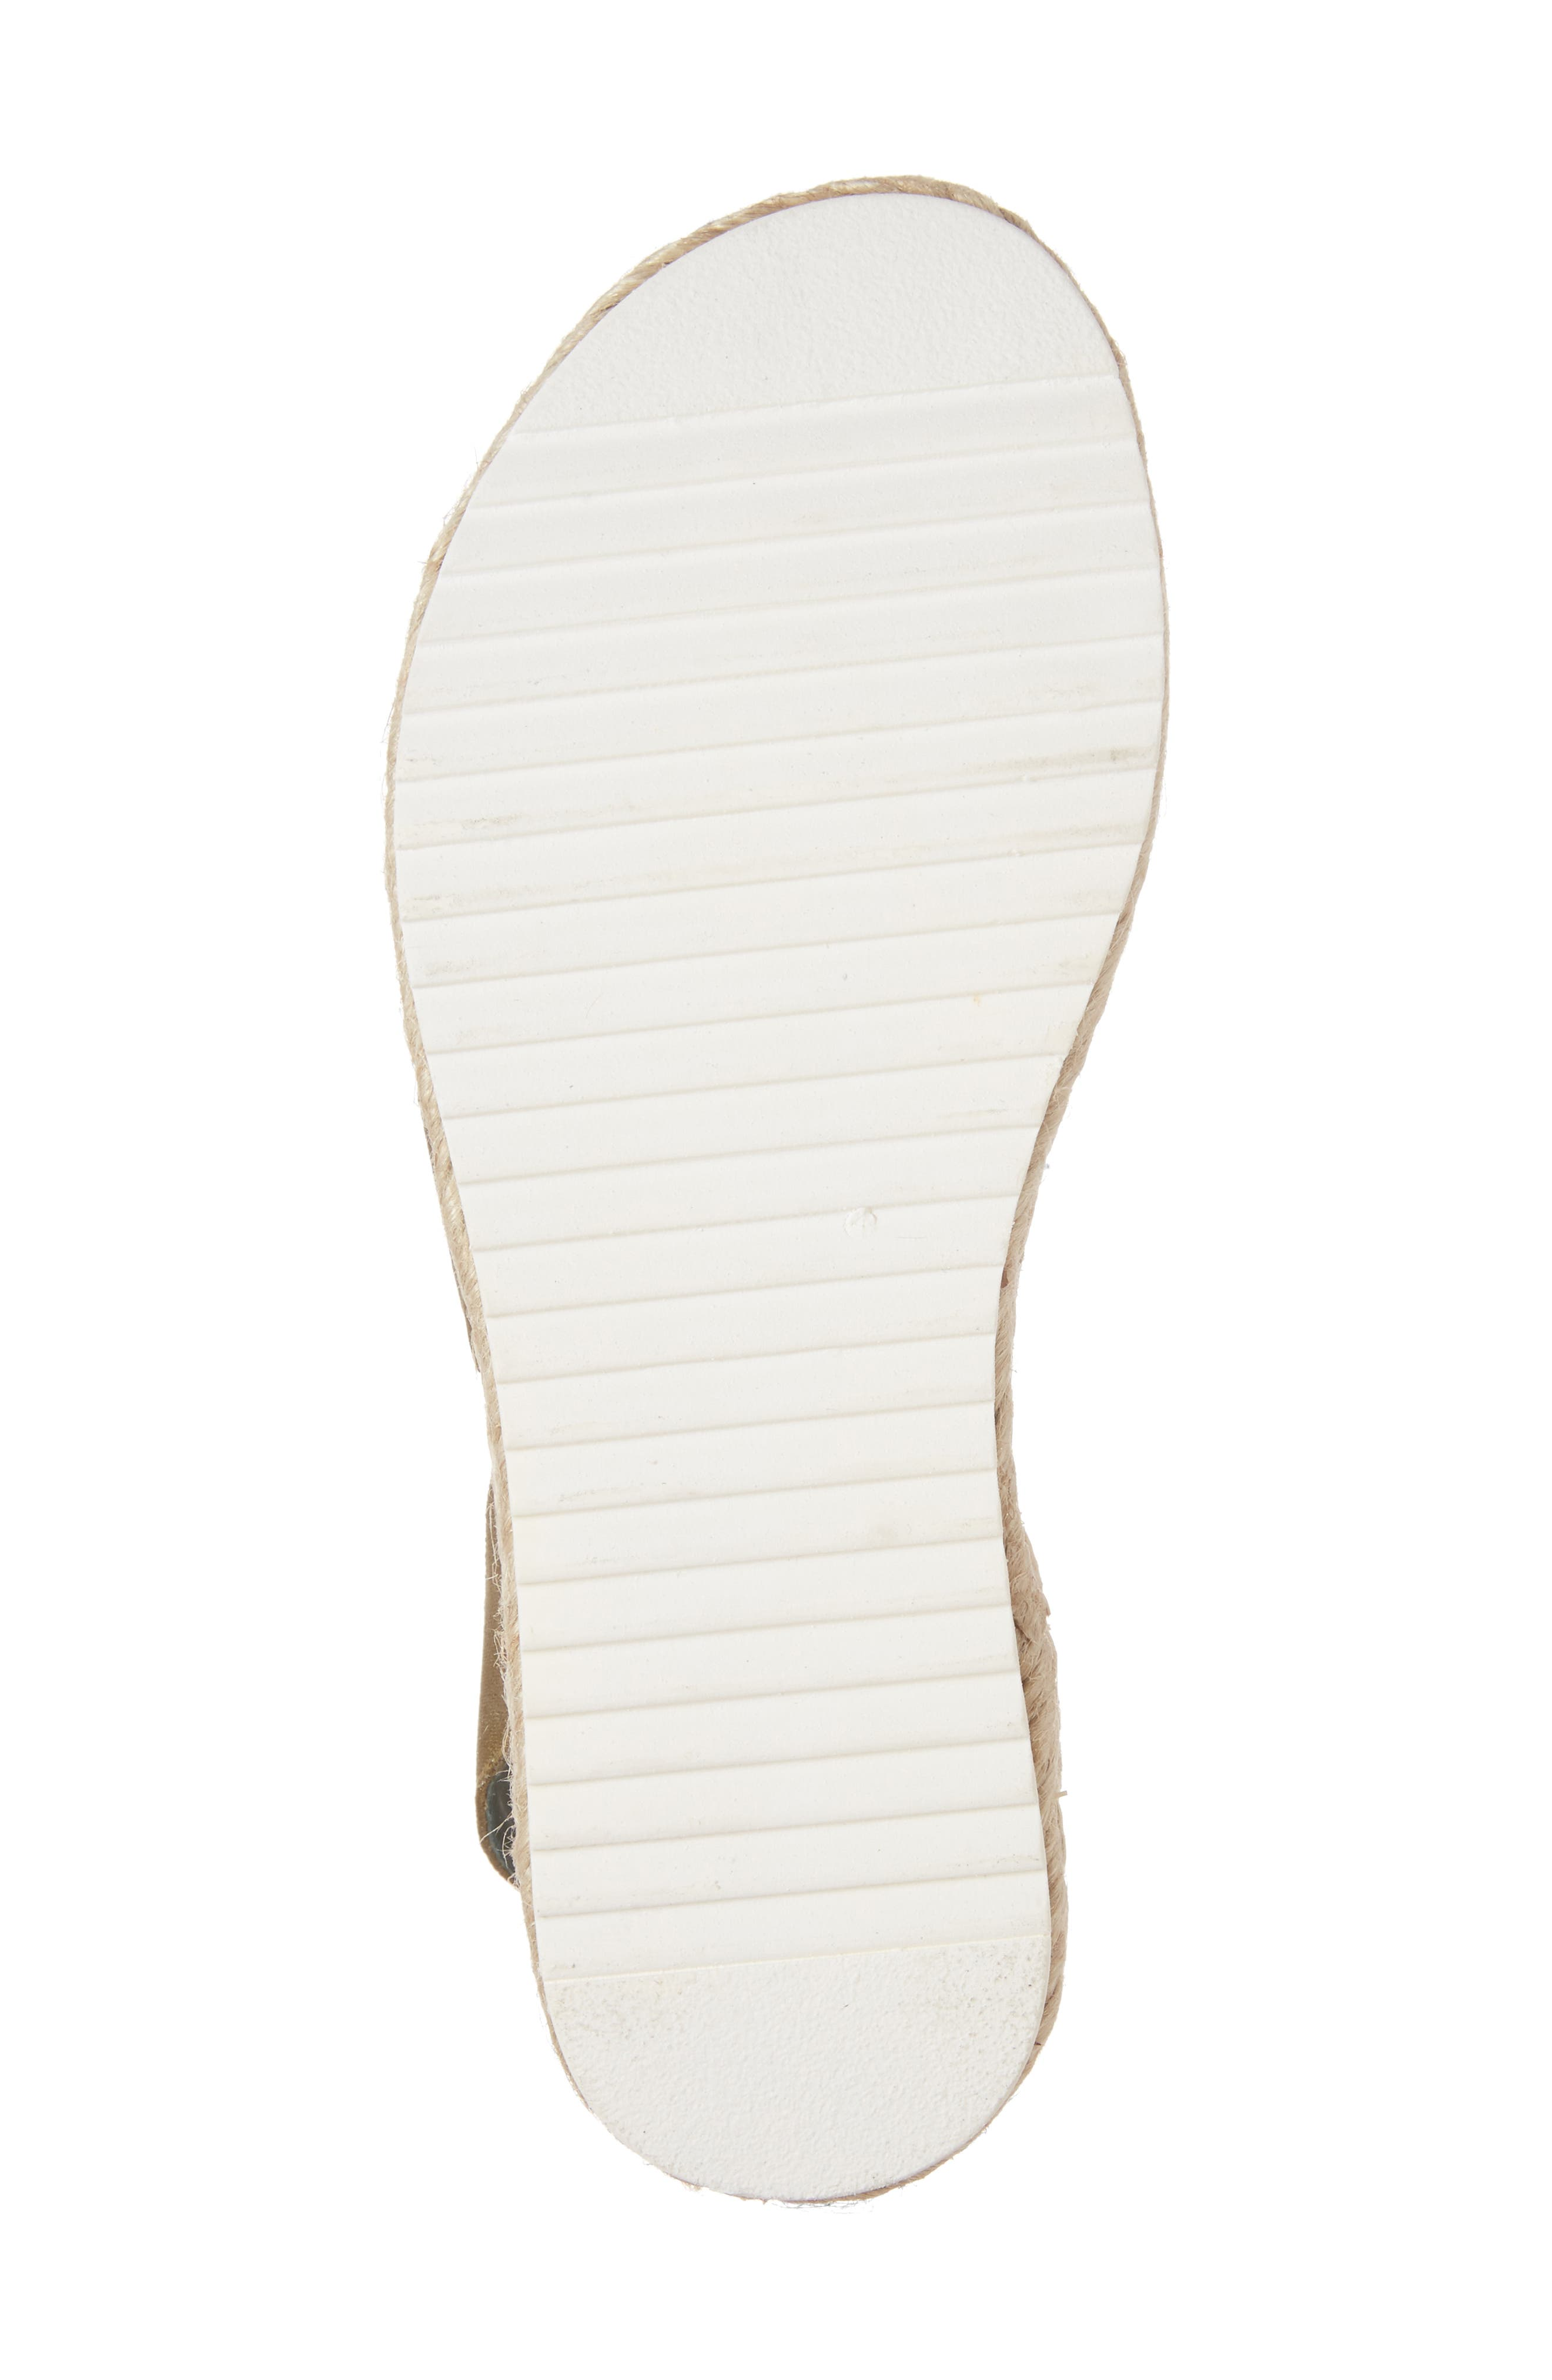 Kimmie Flatform Sandal,                             Alternate thumbnail 18, color,